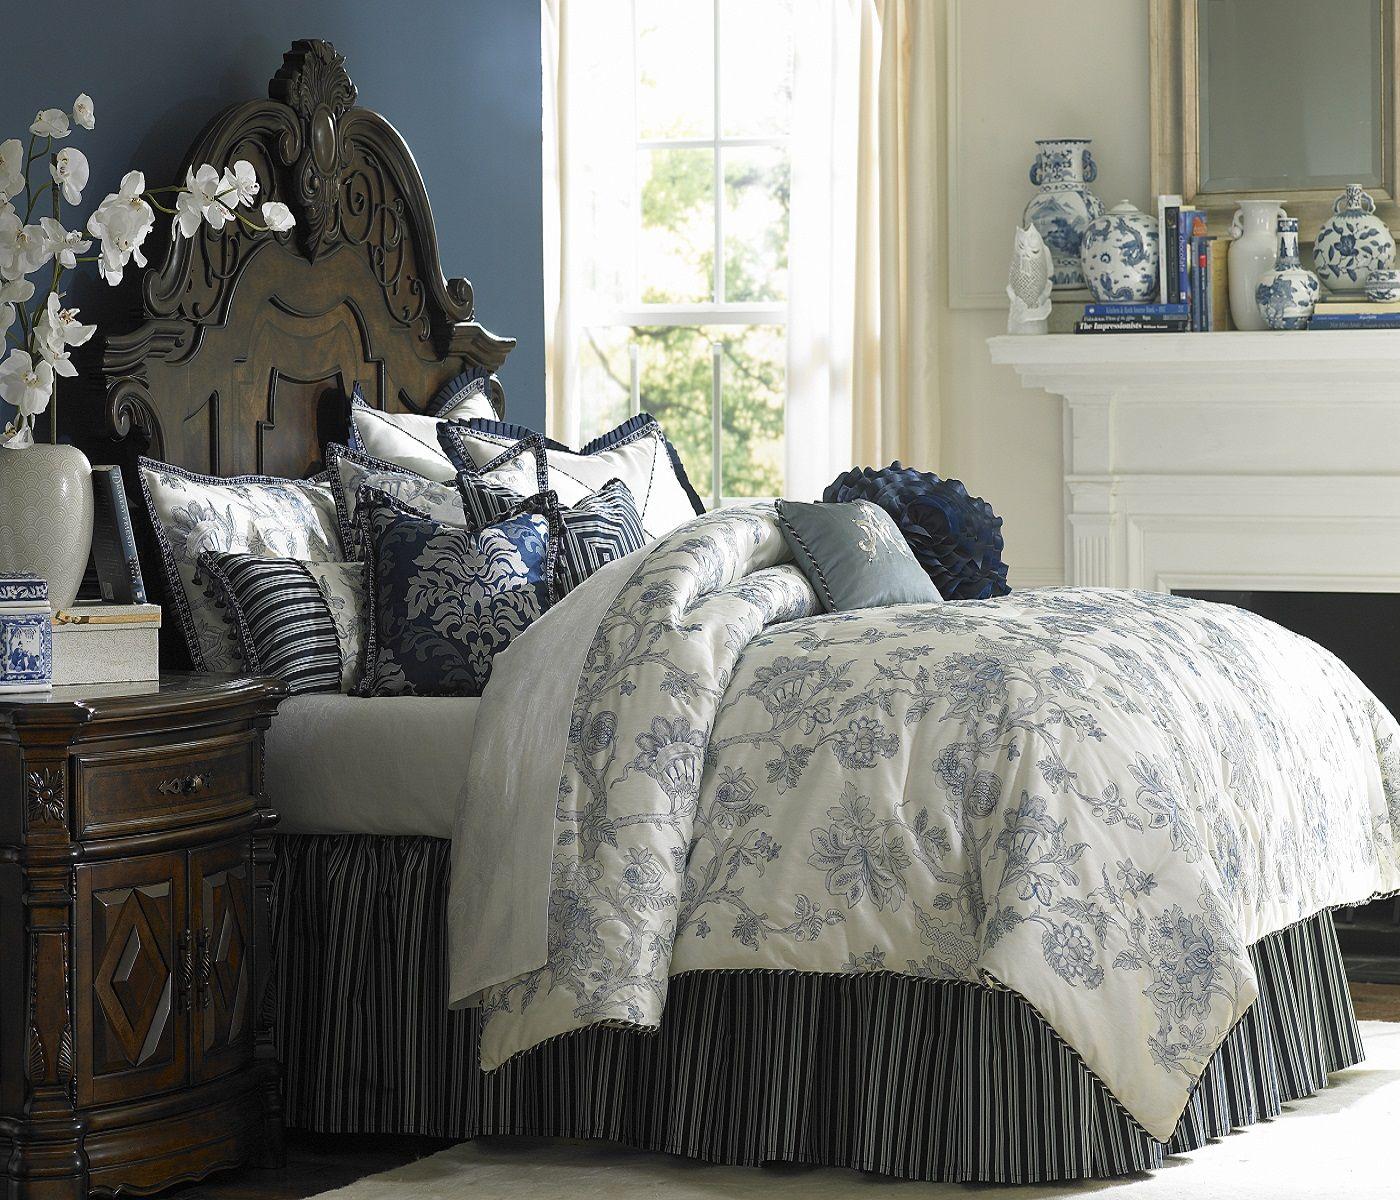 Jardin Bed Set One's Nest Blue Floral Luxury Custom